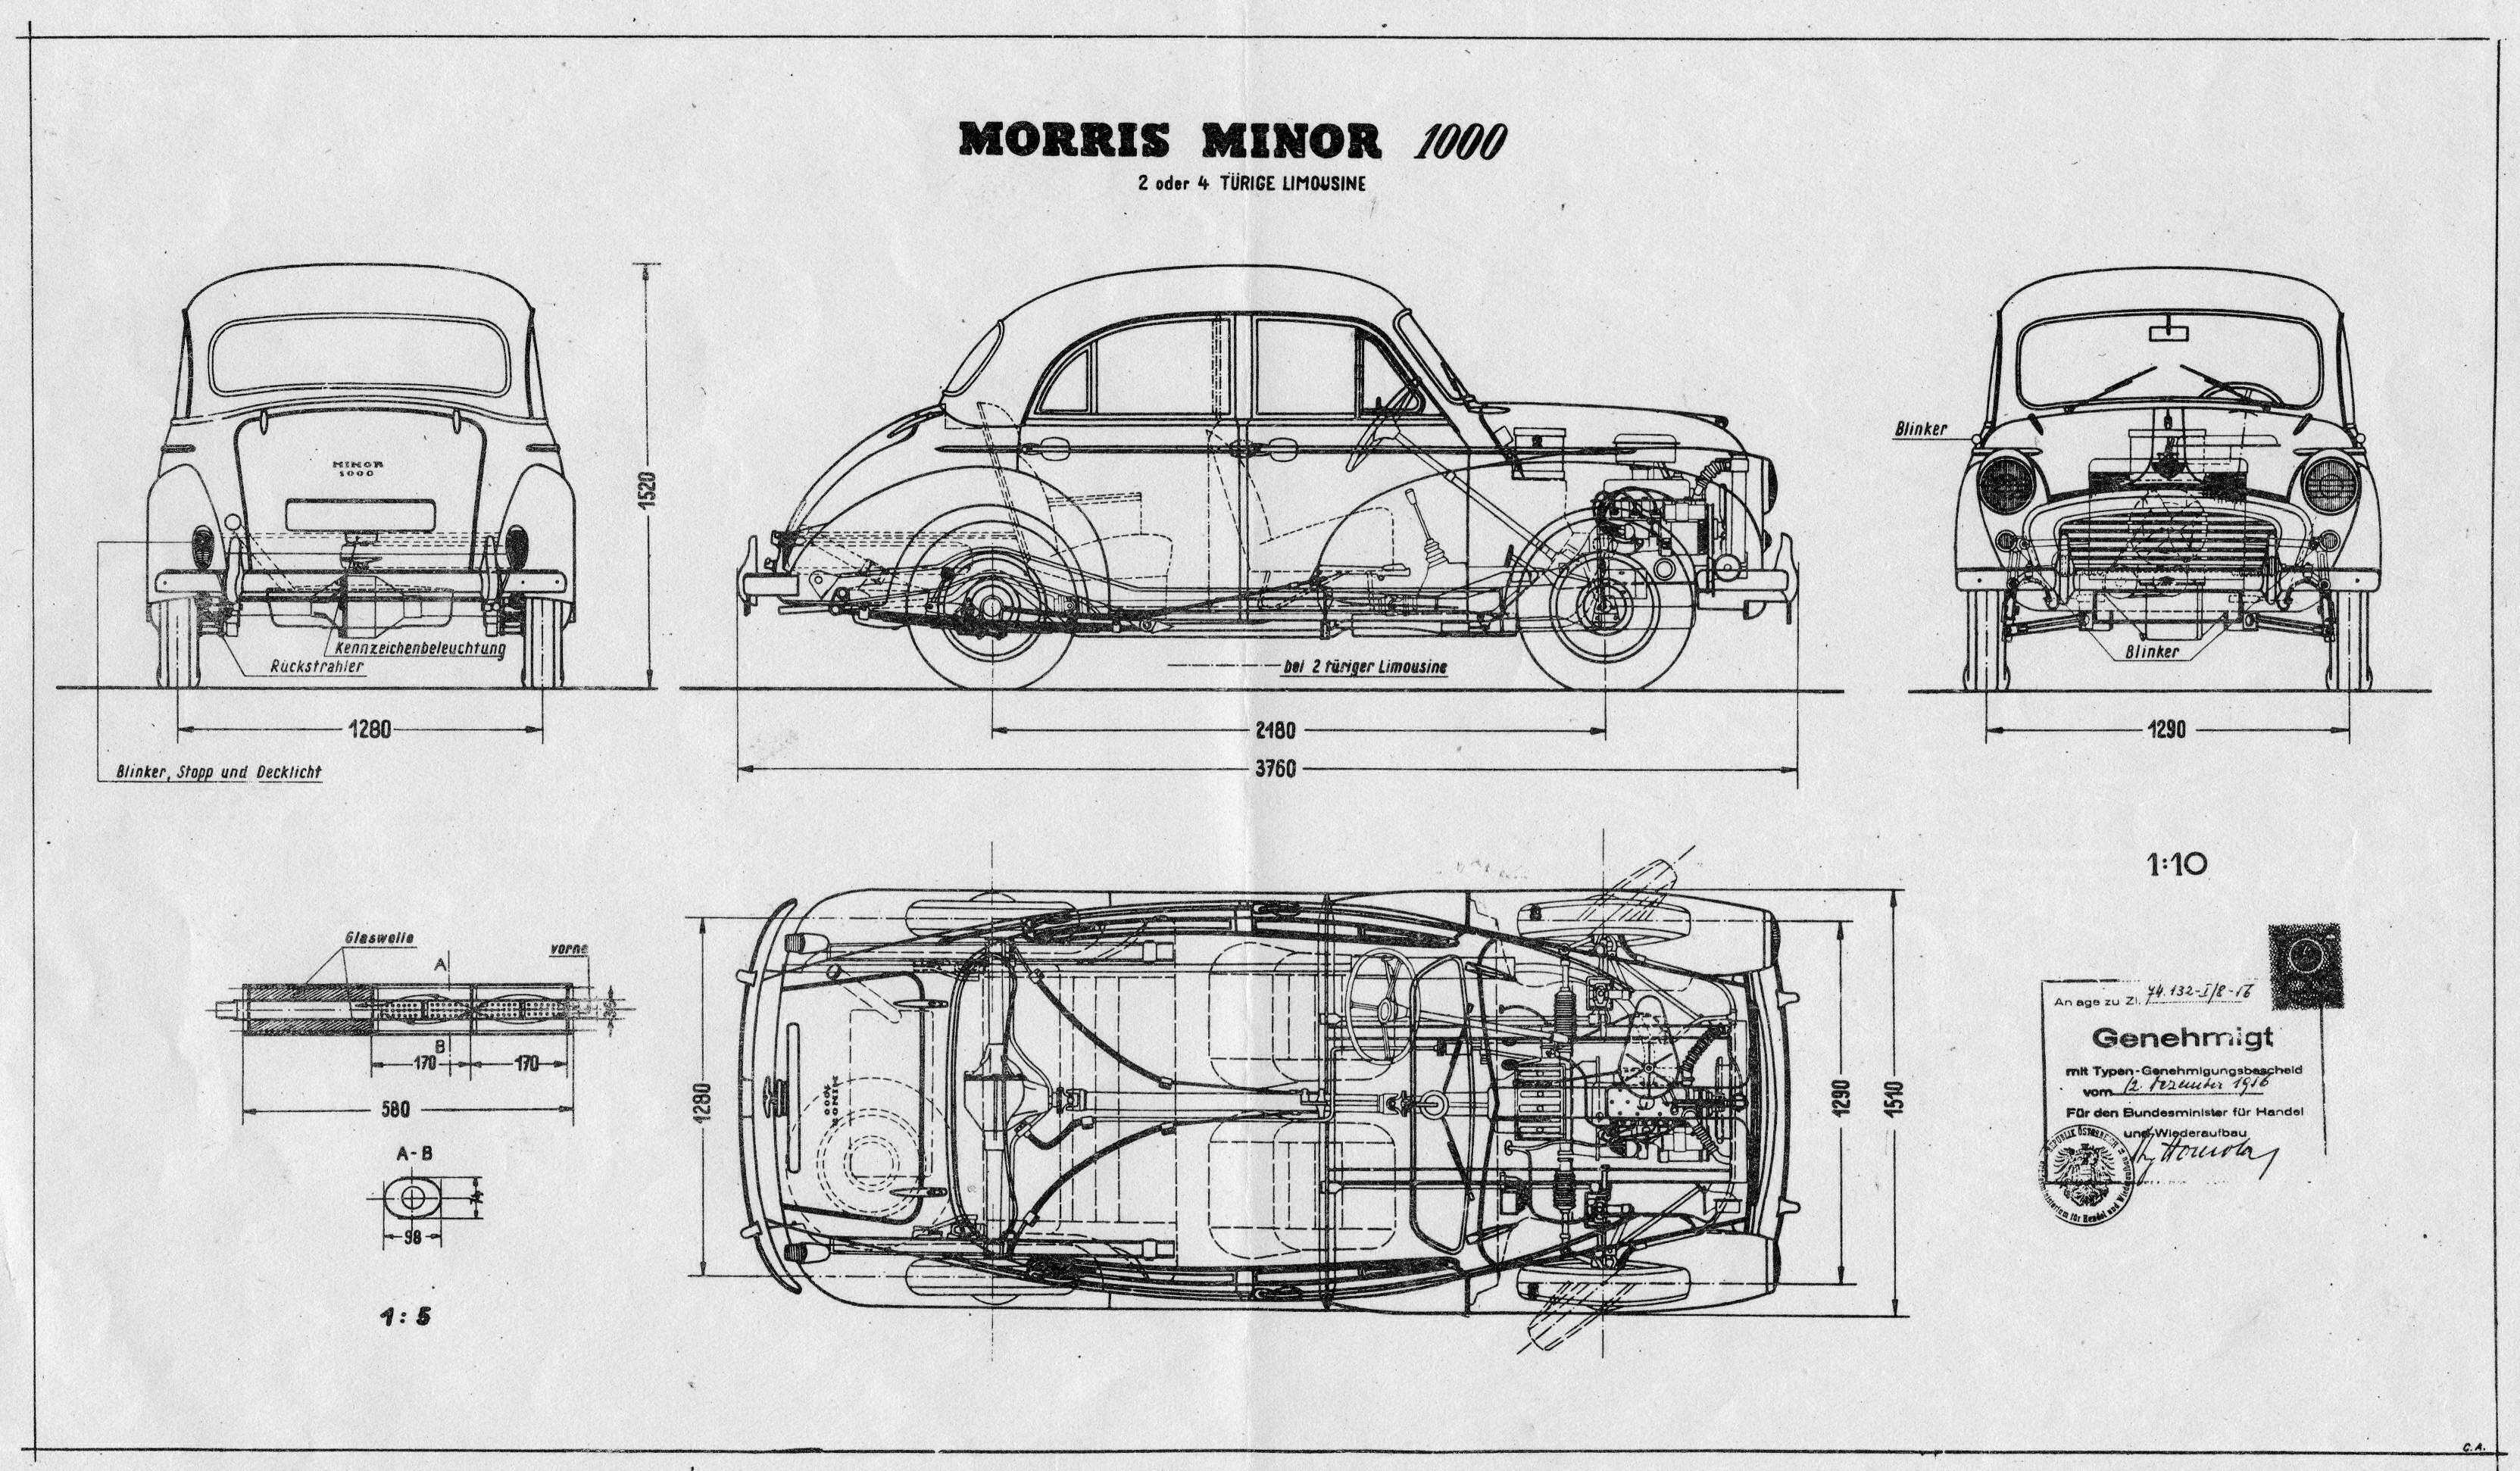 Morris Minor V8